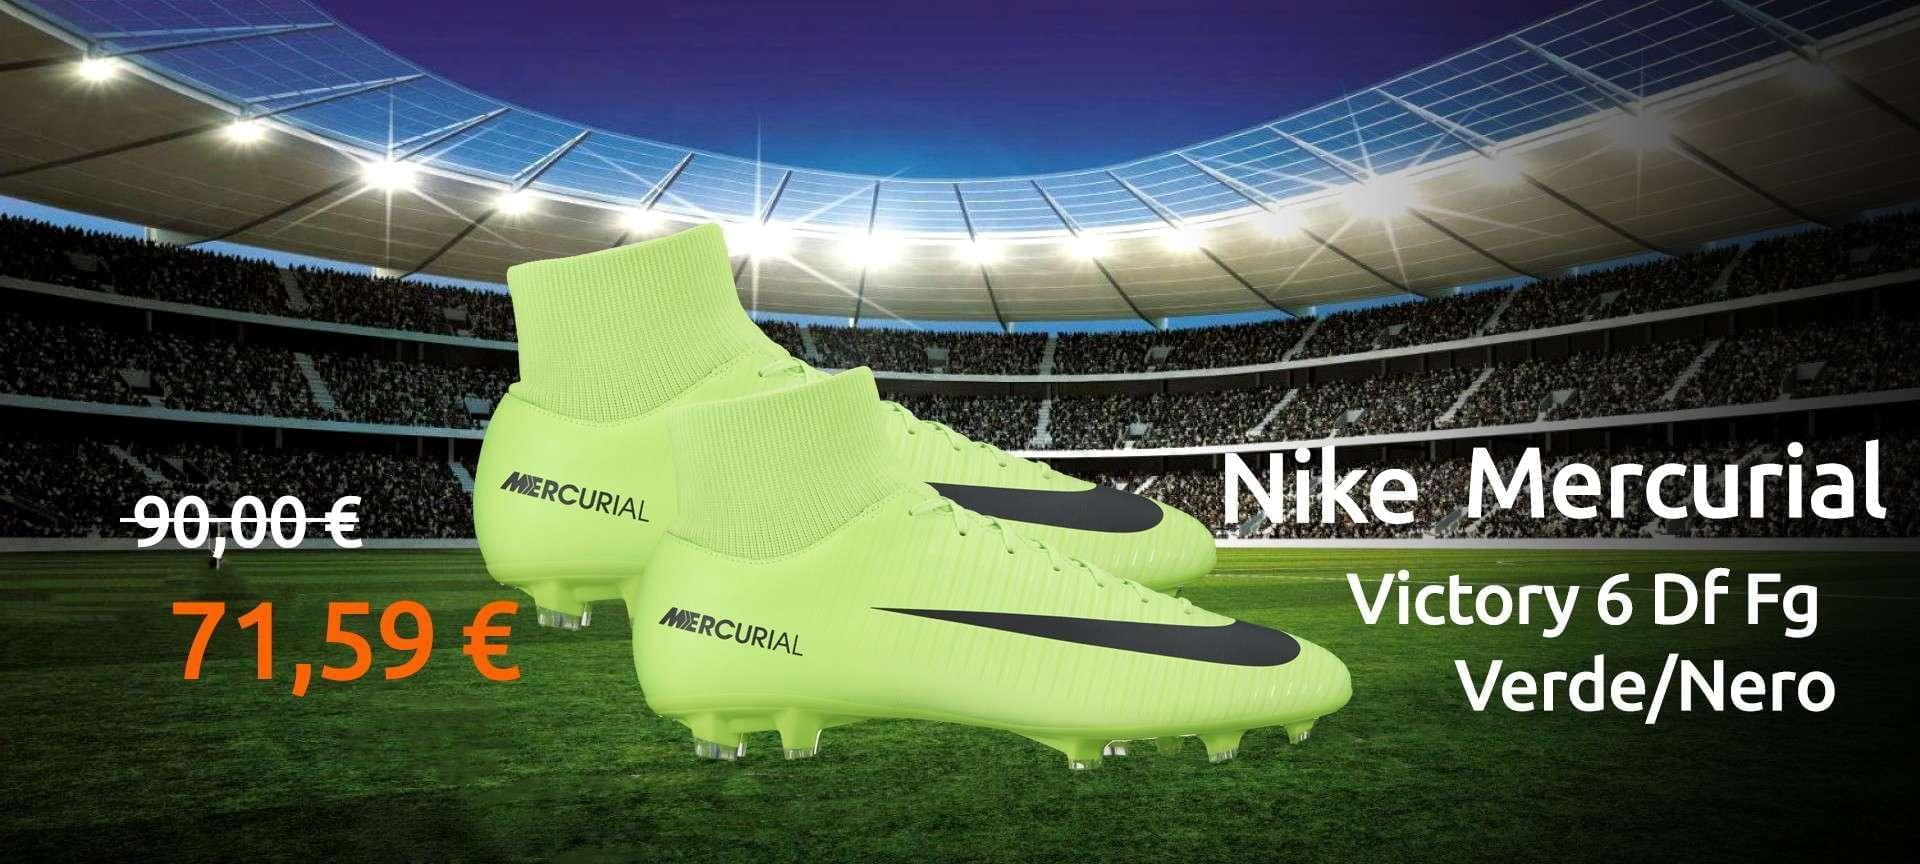 Scarpe Nike Mercurial Victory 6 Df Fg Verde/Nero